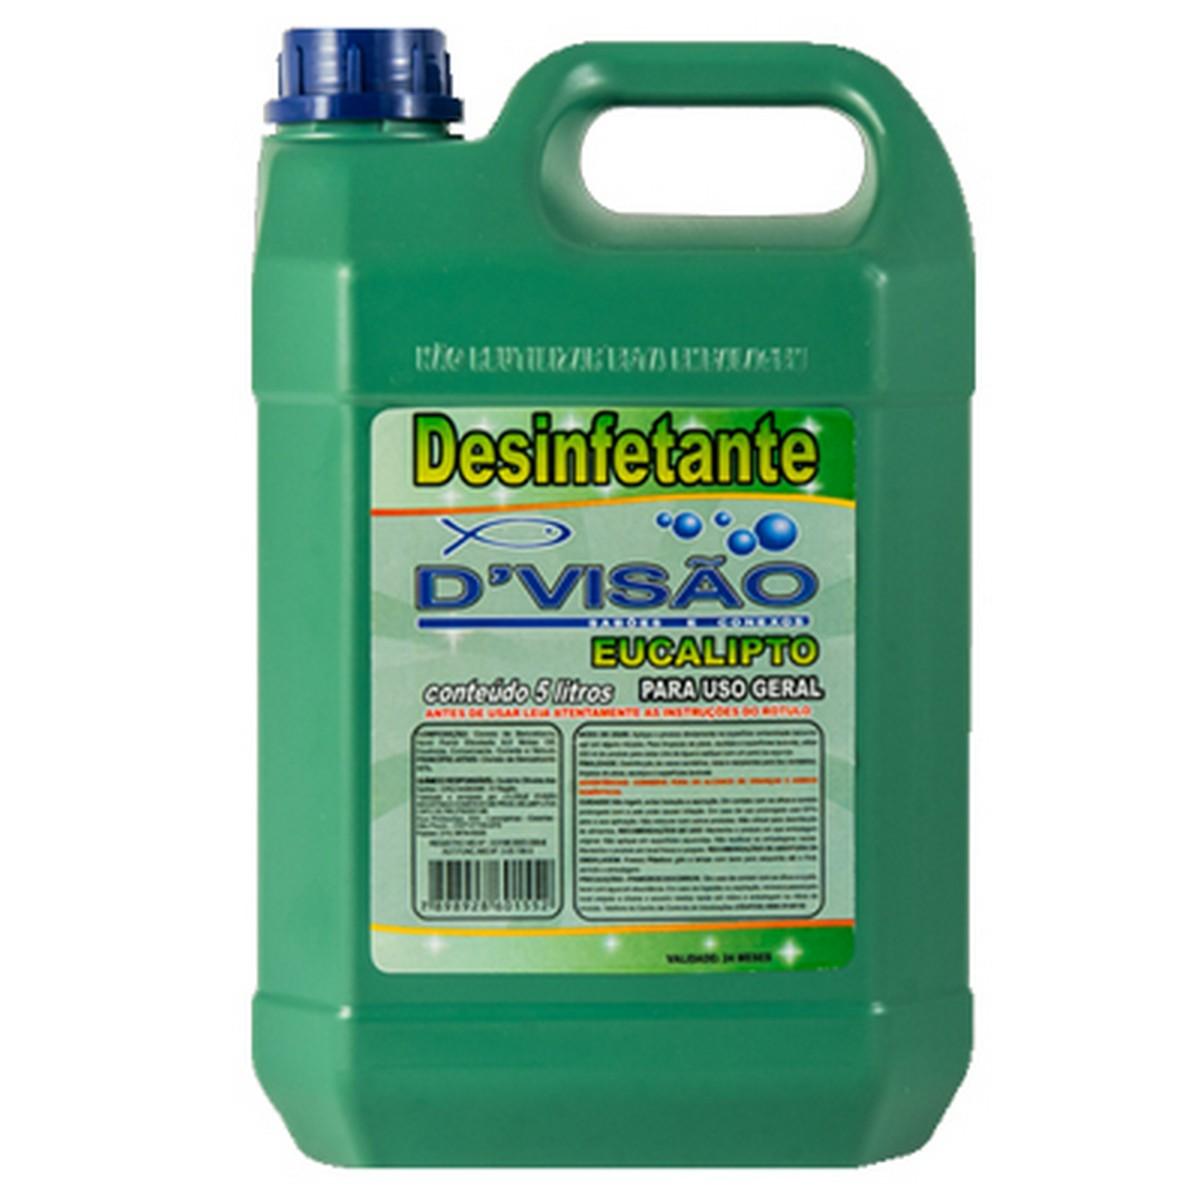 Distribuidora de desinfetante